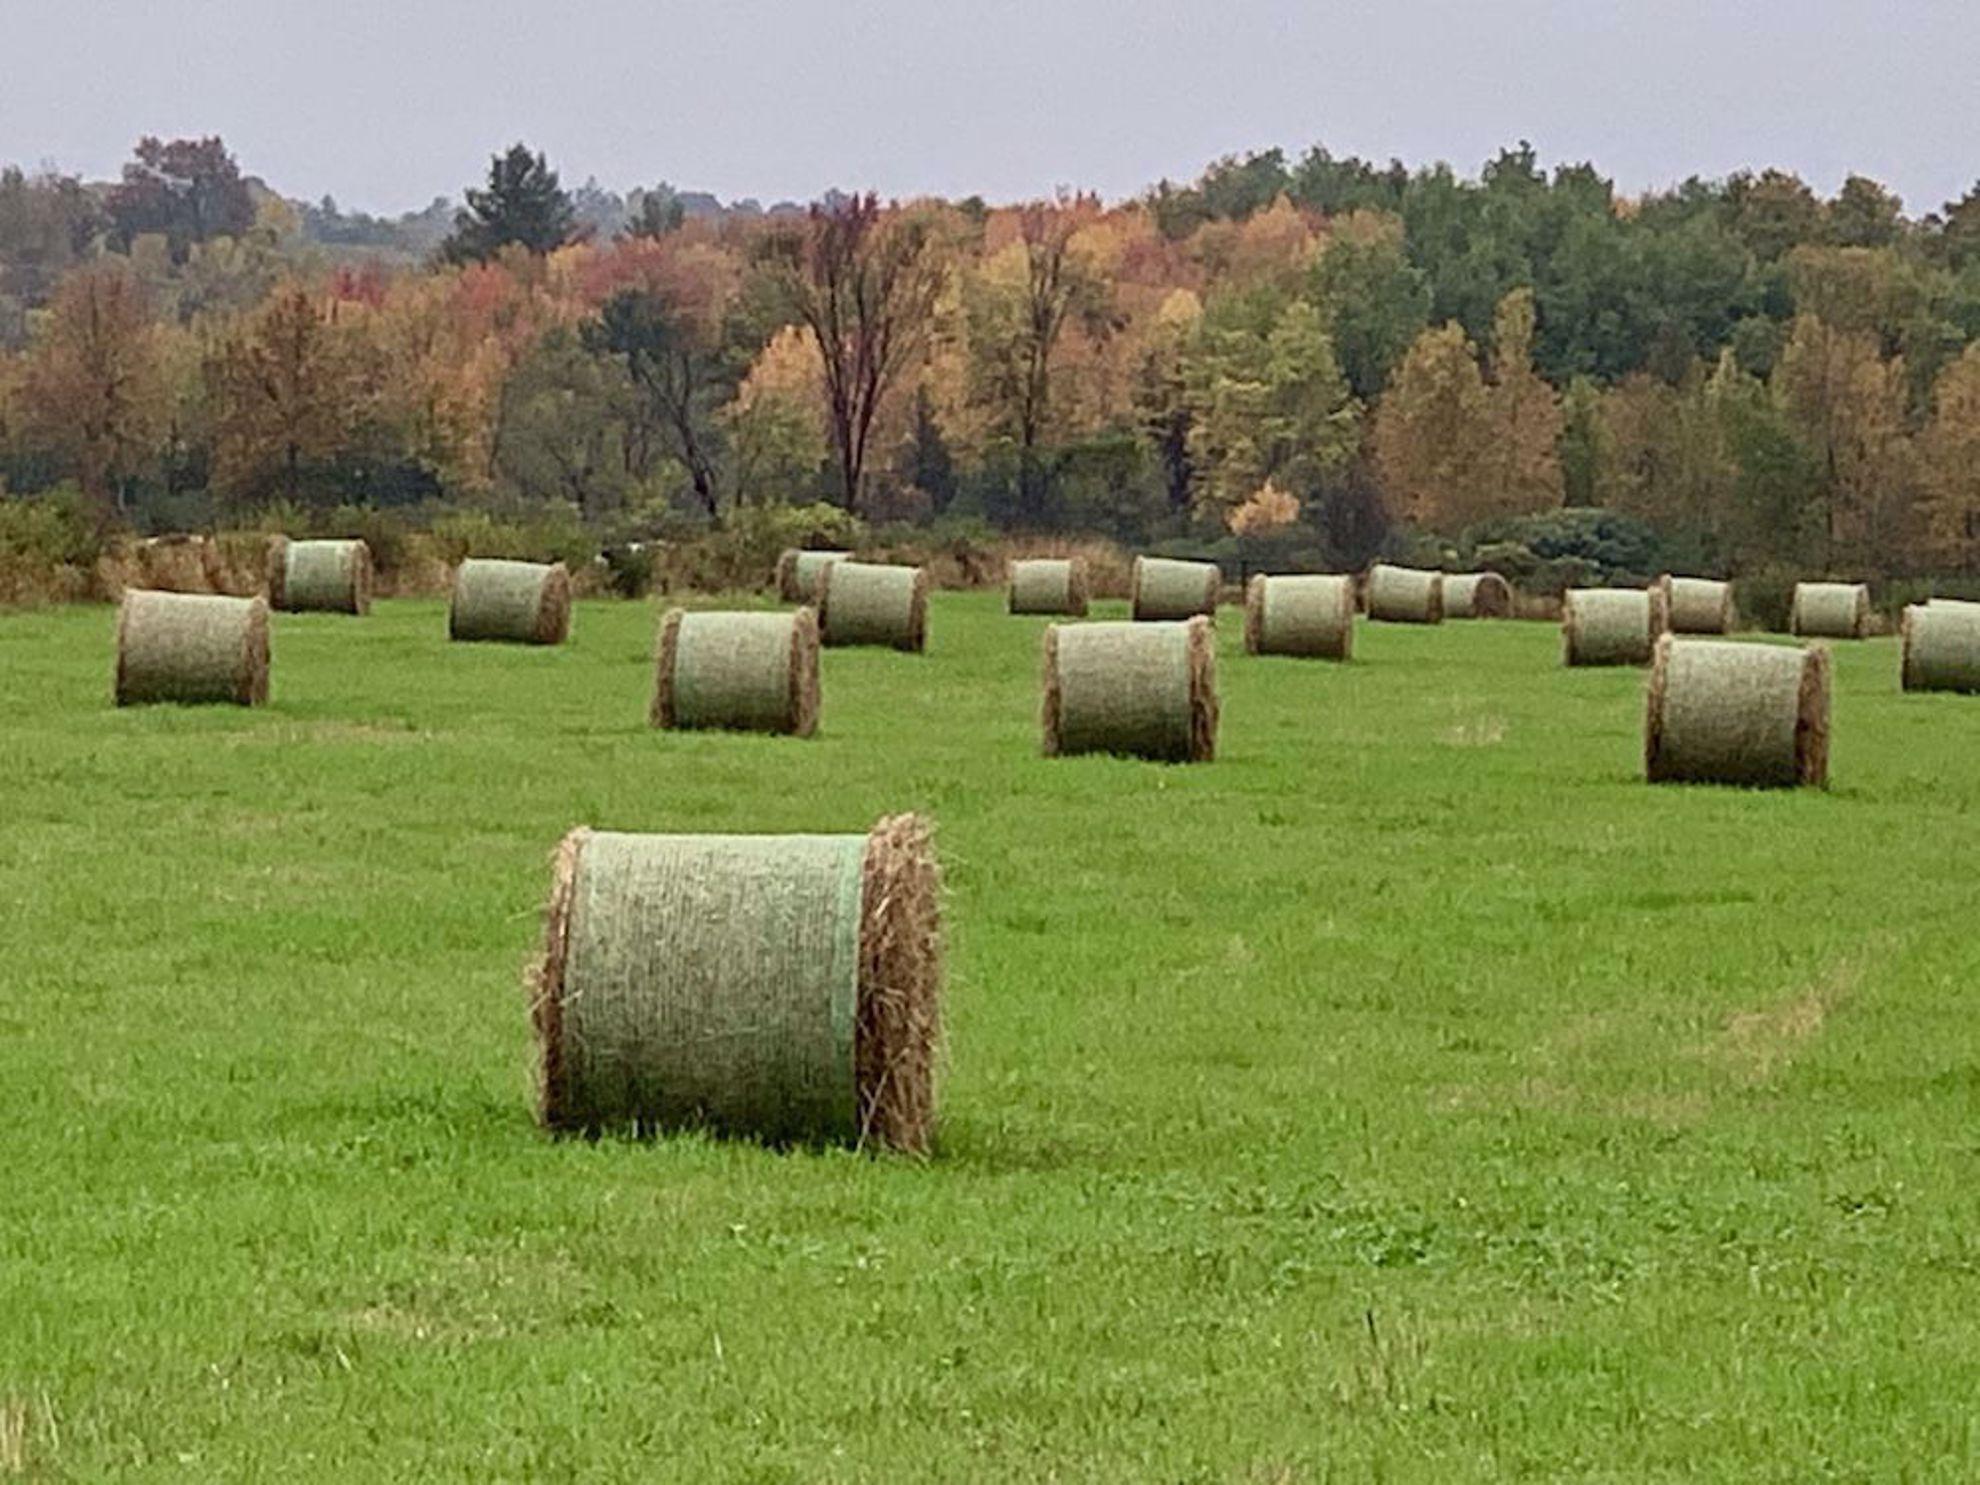 Hay bales and fall colors